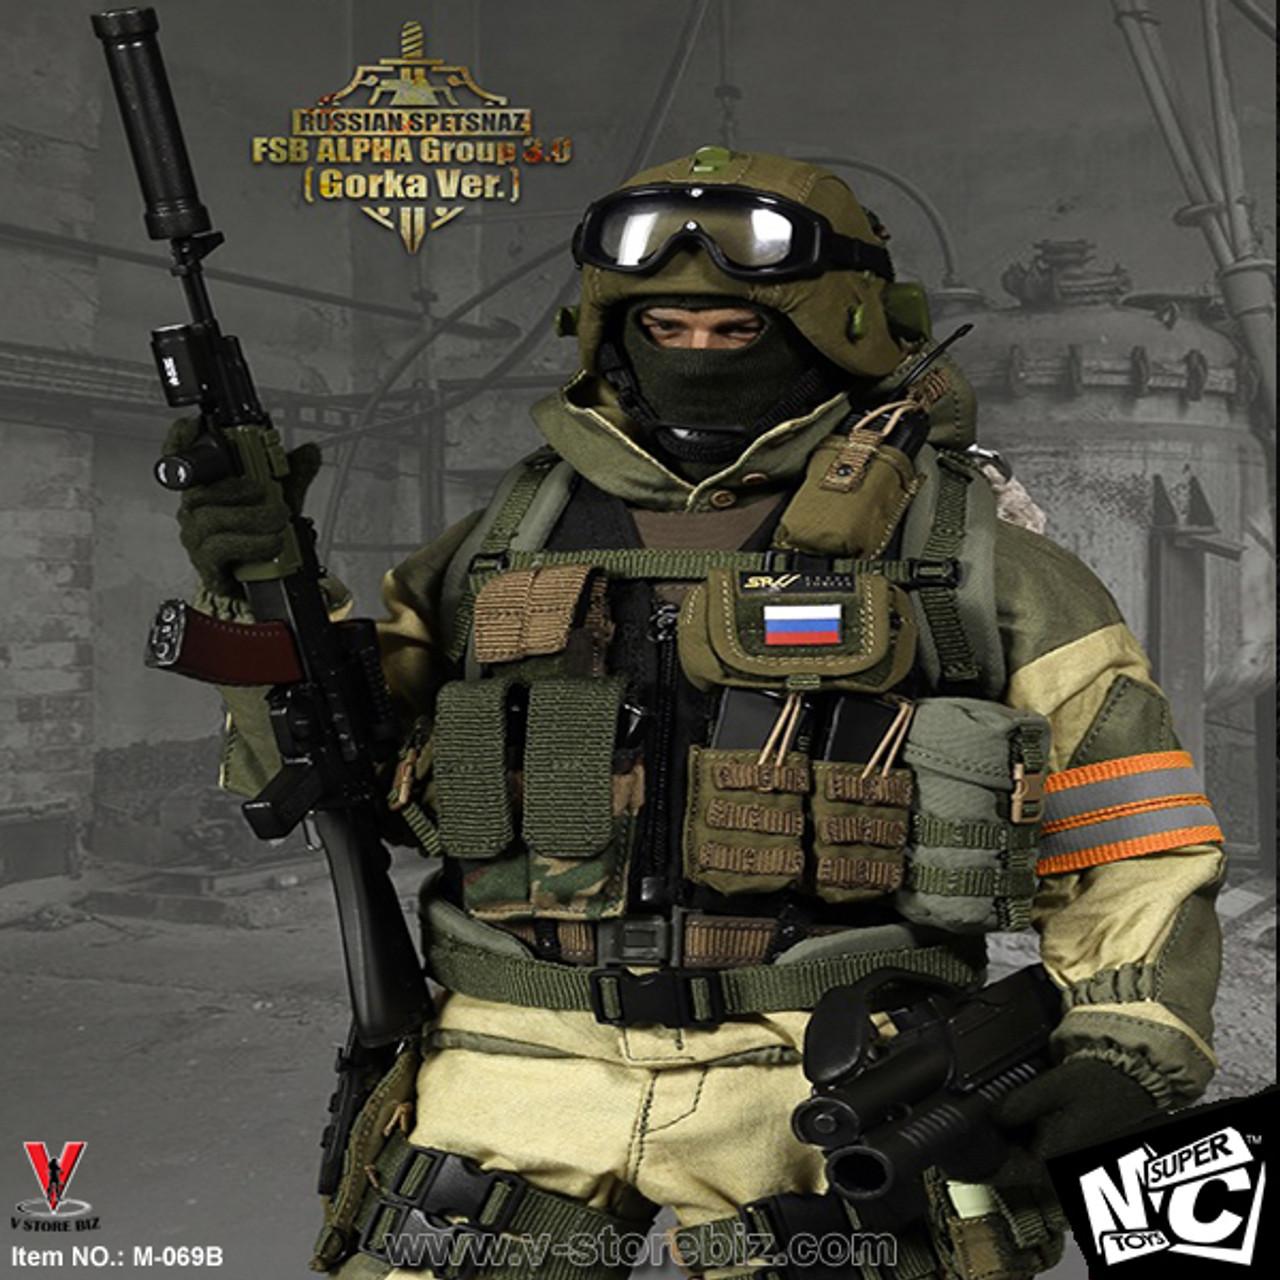 1//6 Scale Russian Spetsnaz FSB Alfa Group 3.0 Black Radio